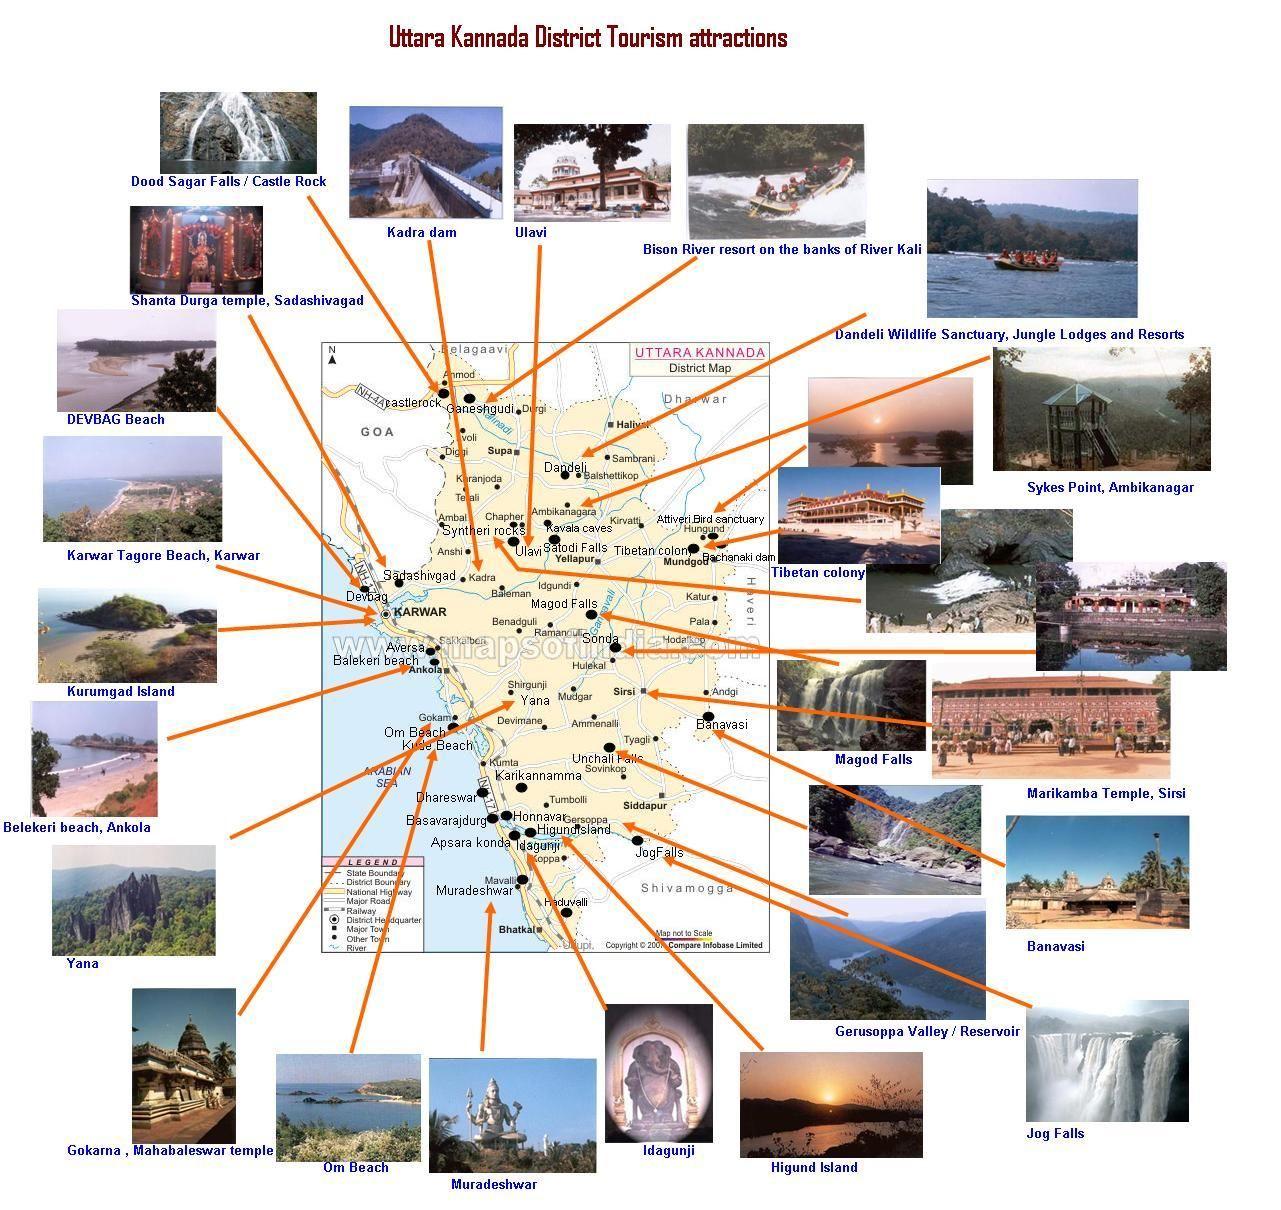 FileUttara Kannada District Tourism MapJPG KarnatakaMysore